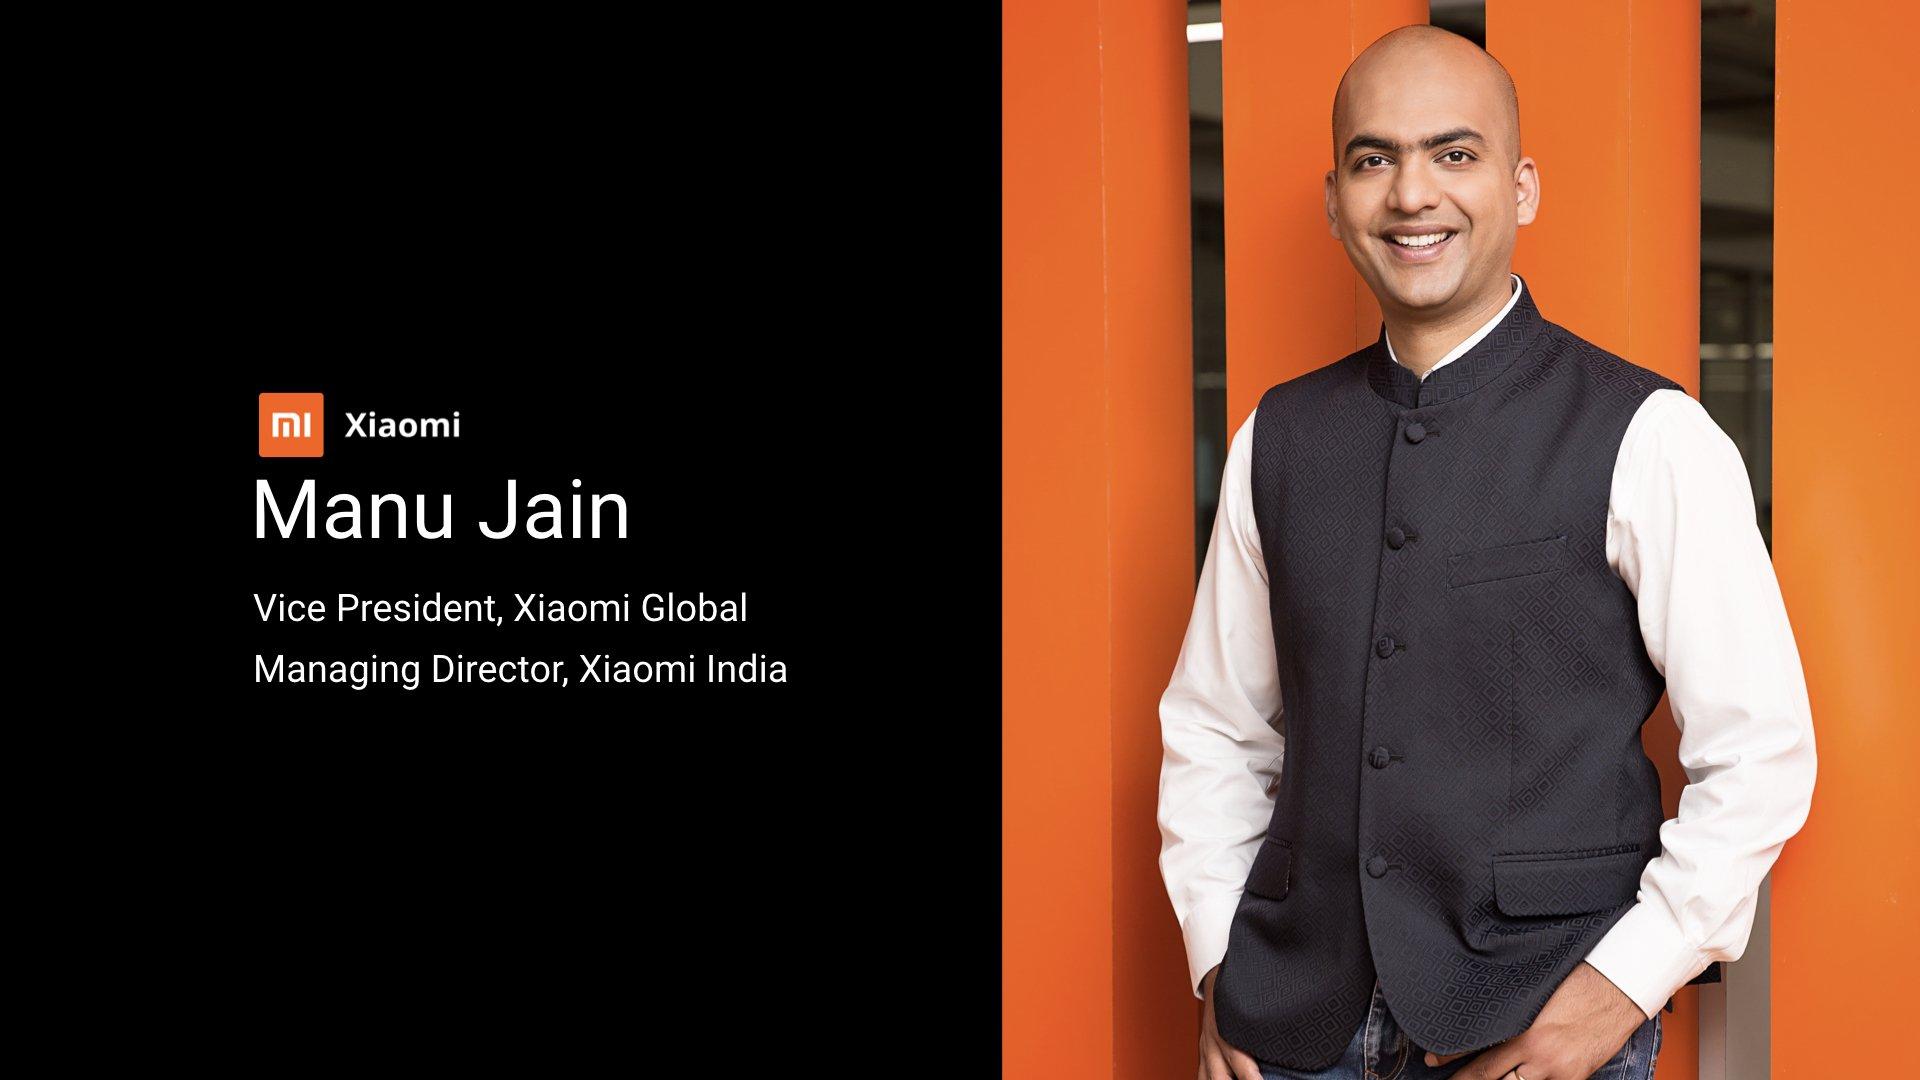 Manu Kumar Jain asume nuevos cargos en Xiaomi. Noticias Xiaomi Adictos